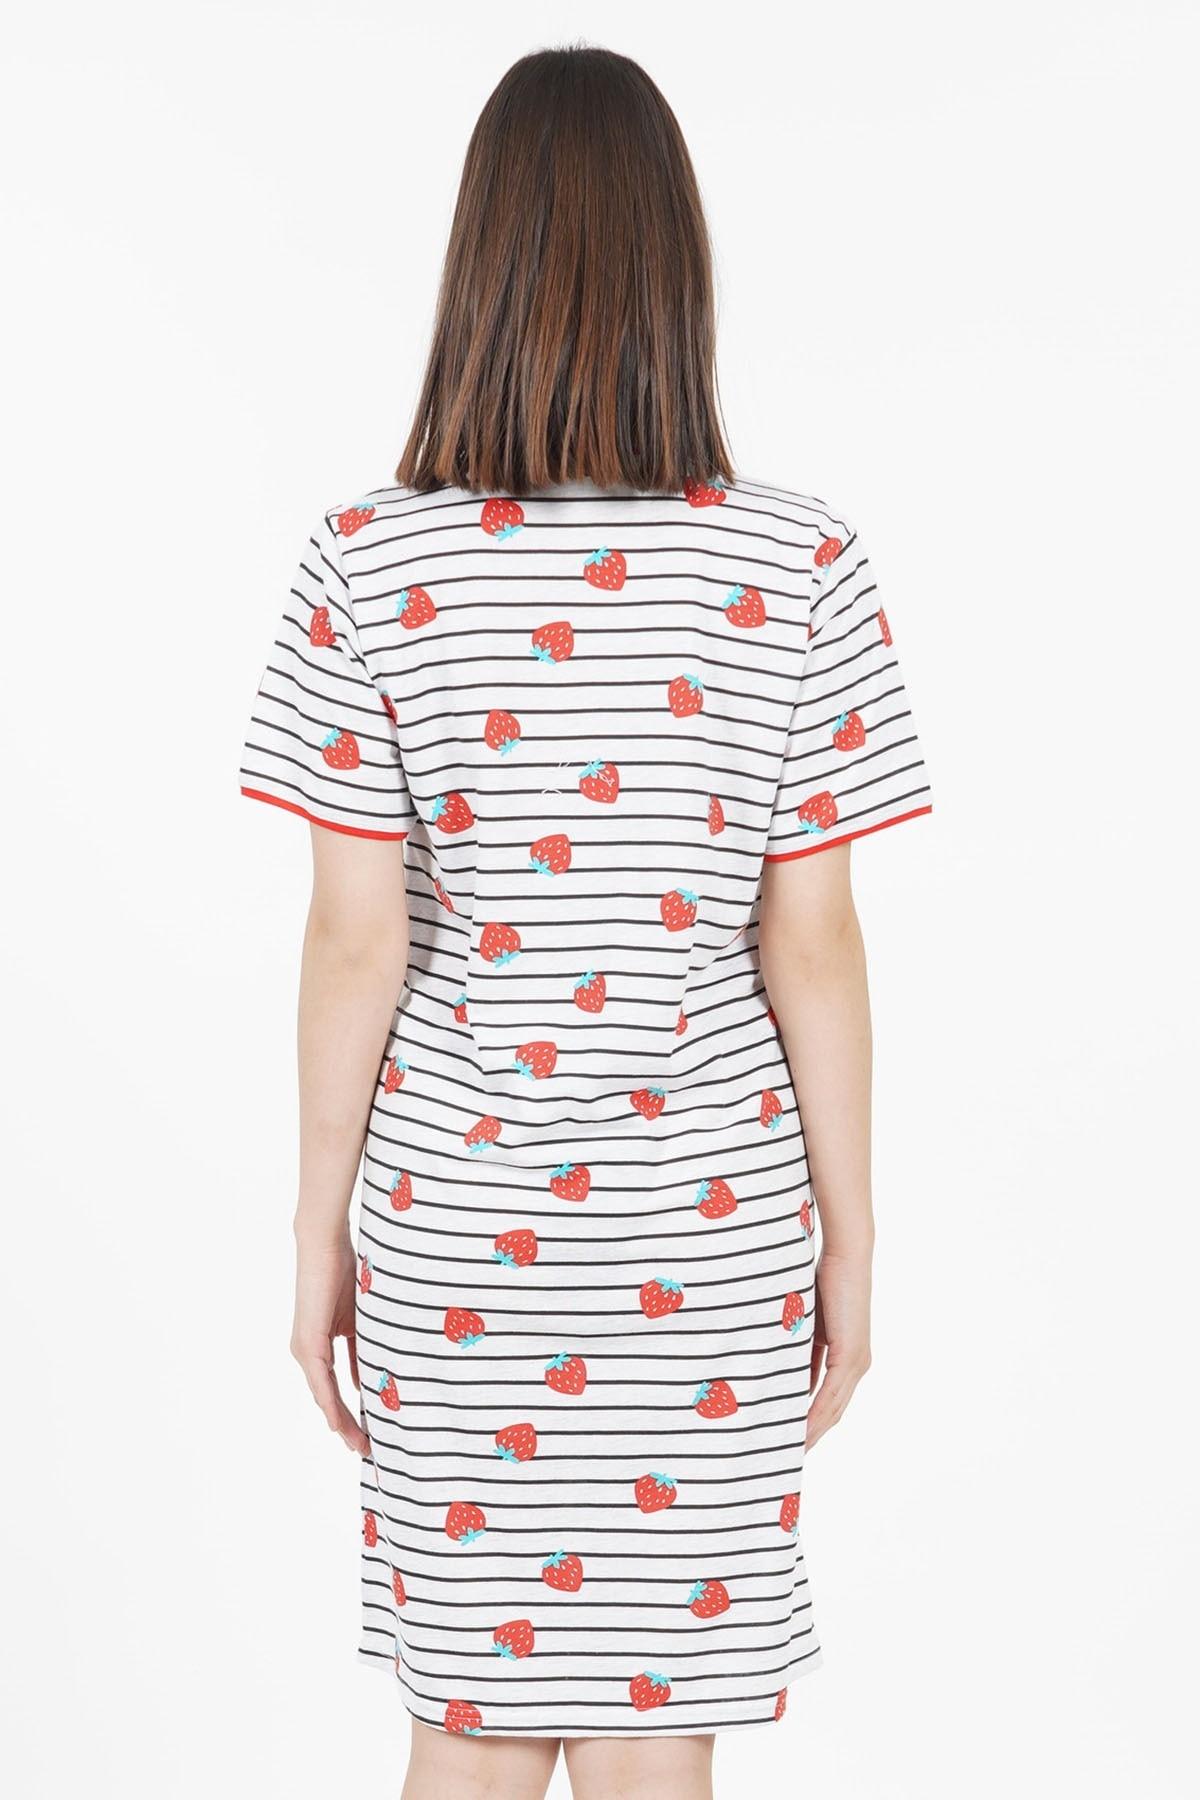 100% Cotton Short Sleeve Pregnant Woman Dress Maternity Nightgown Pajamas Clothing Cloths Sleep Lounge  Bathrobe enlarge